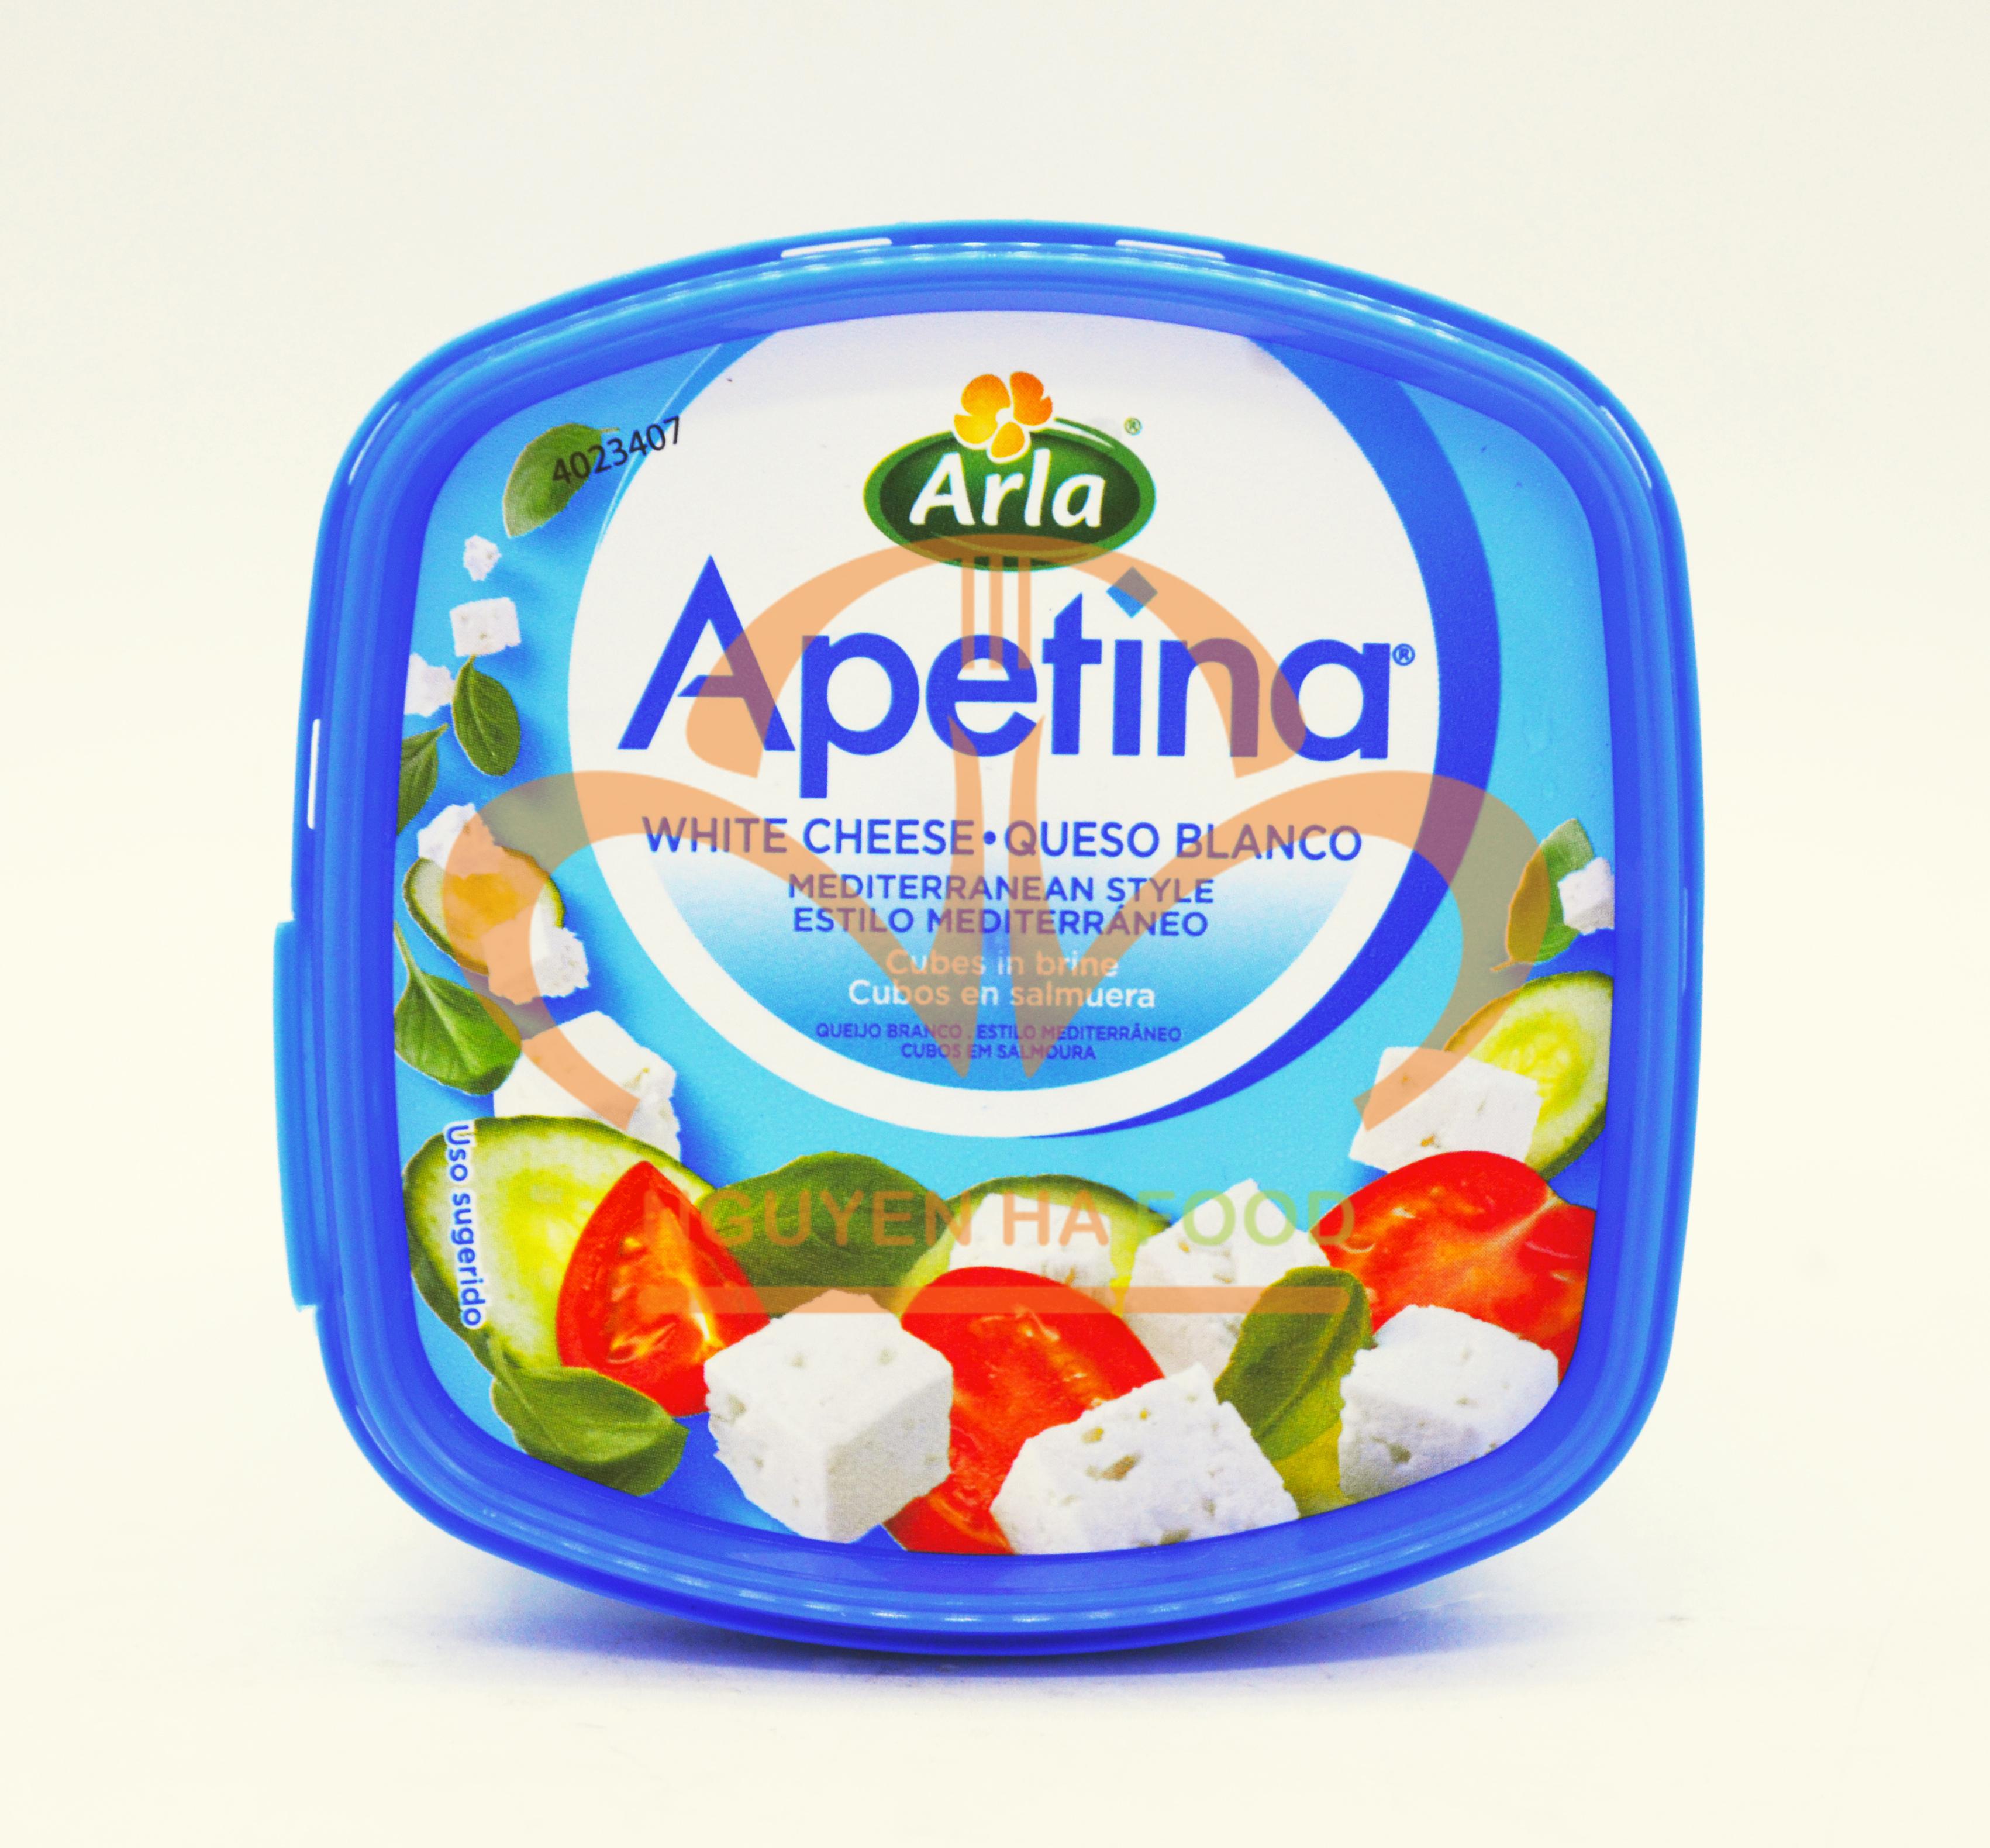 pho-mai-trang-cat-hat-luu-apetina-390g-nguyen-ha-food-06